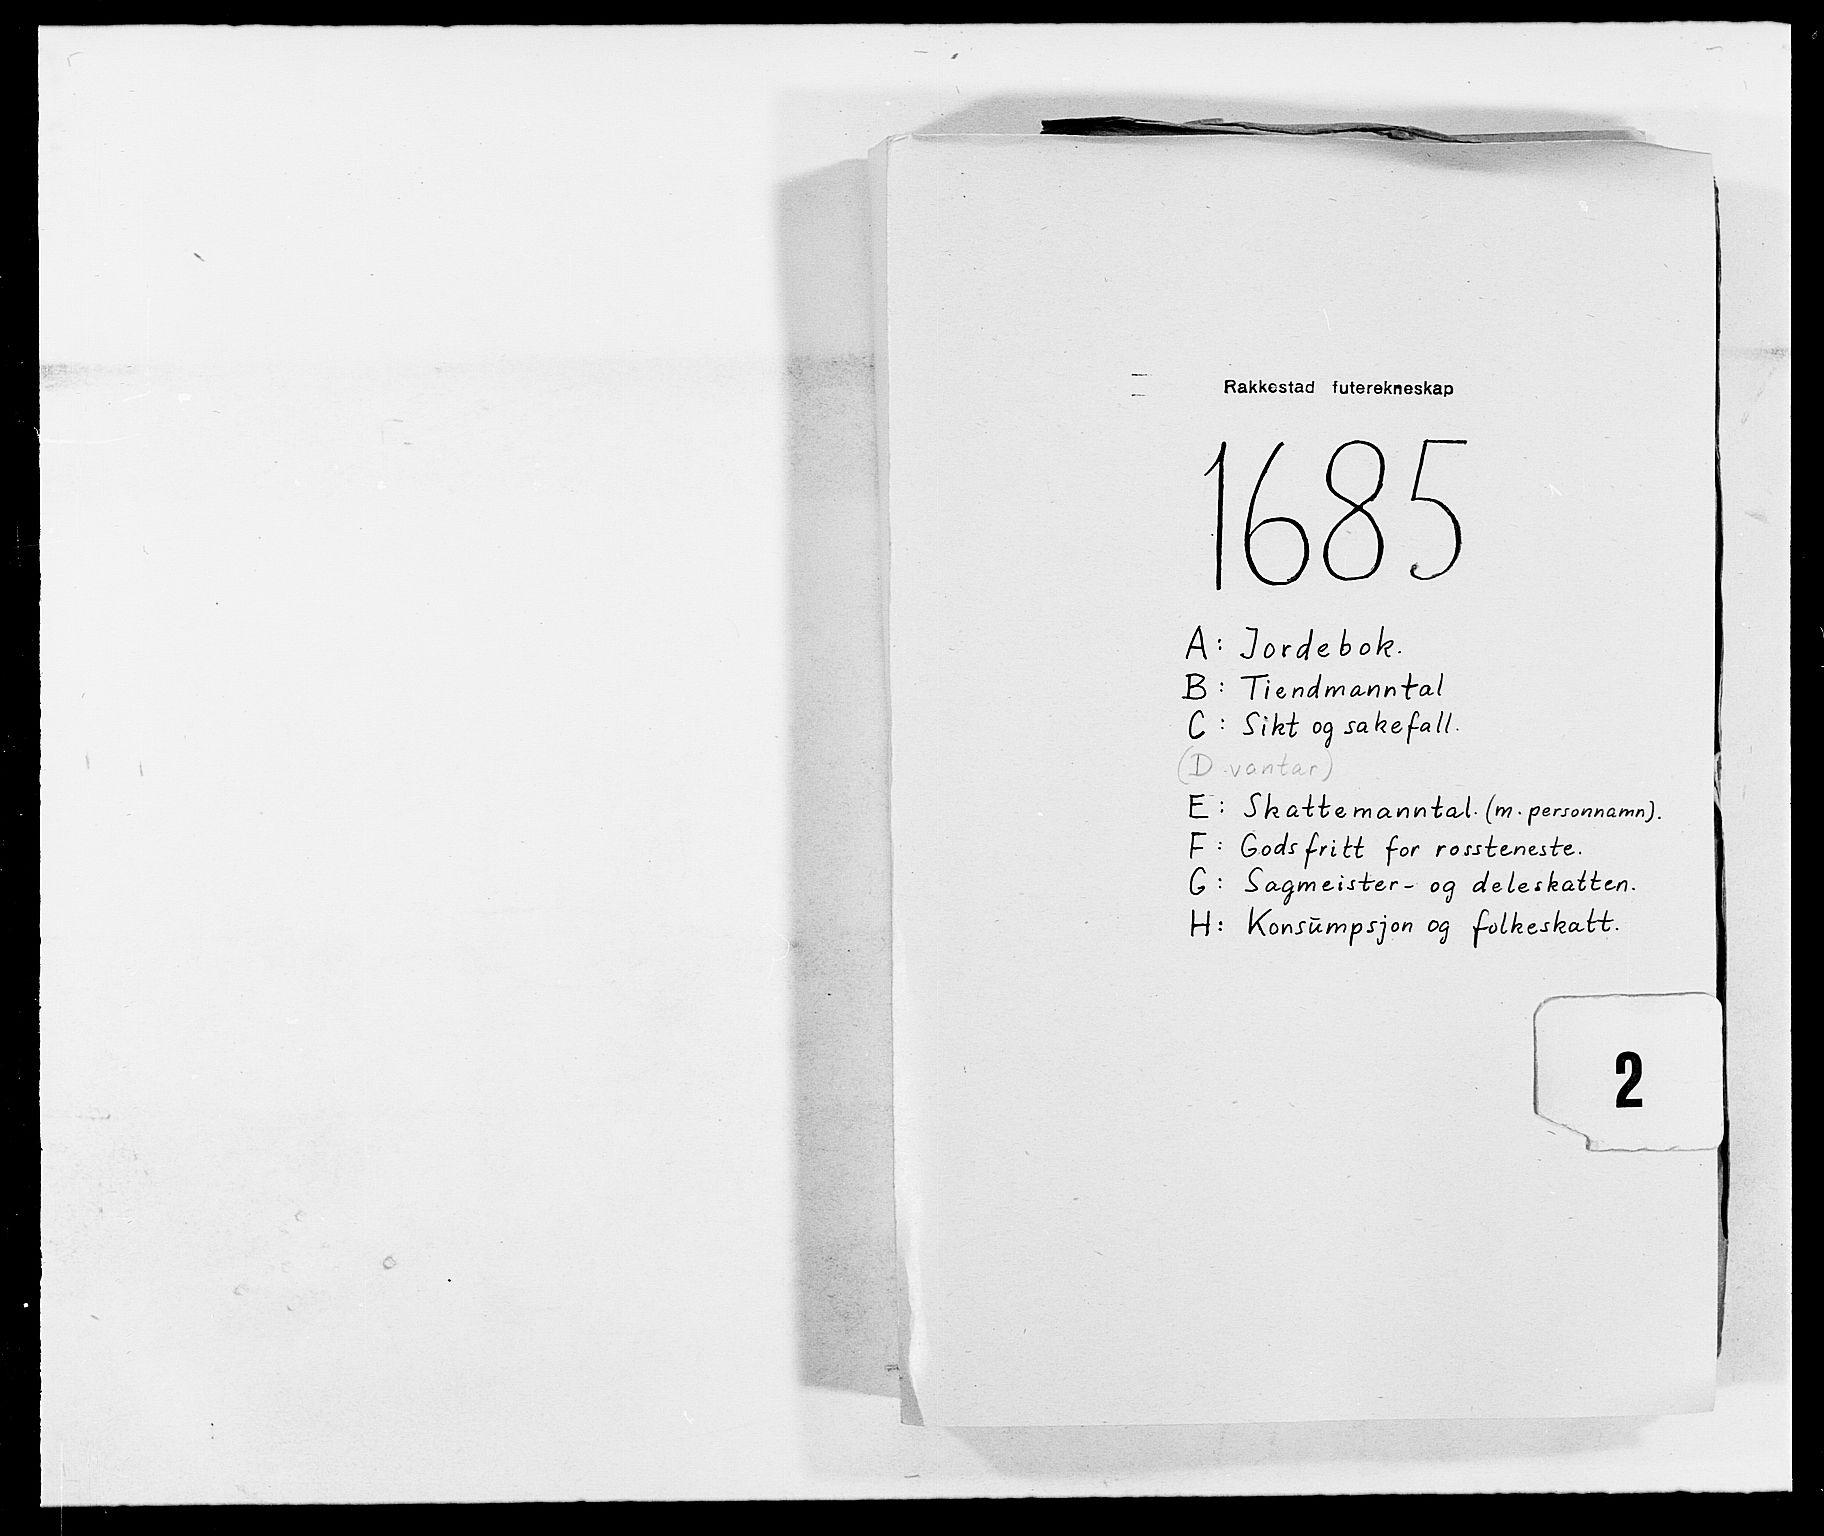 RA, Rentekammeret inntil 1814, Reviderte regnskaper, Fogderegnskap, R05/L0275: Fogderegnskap Rakkestad, 1685-1686, s. 1